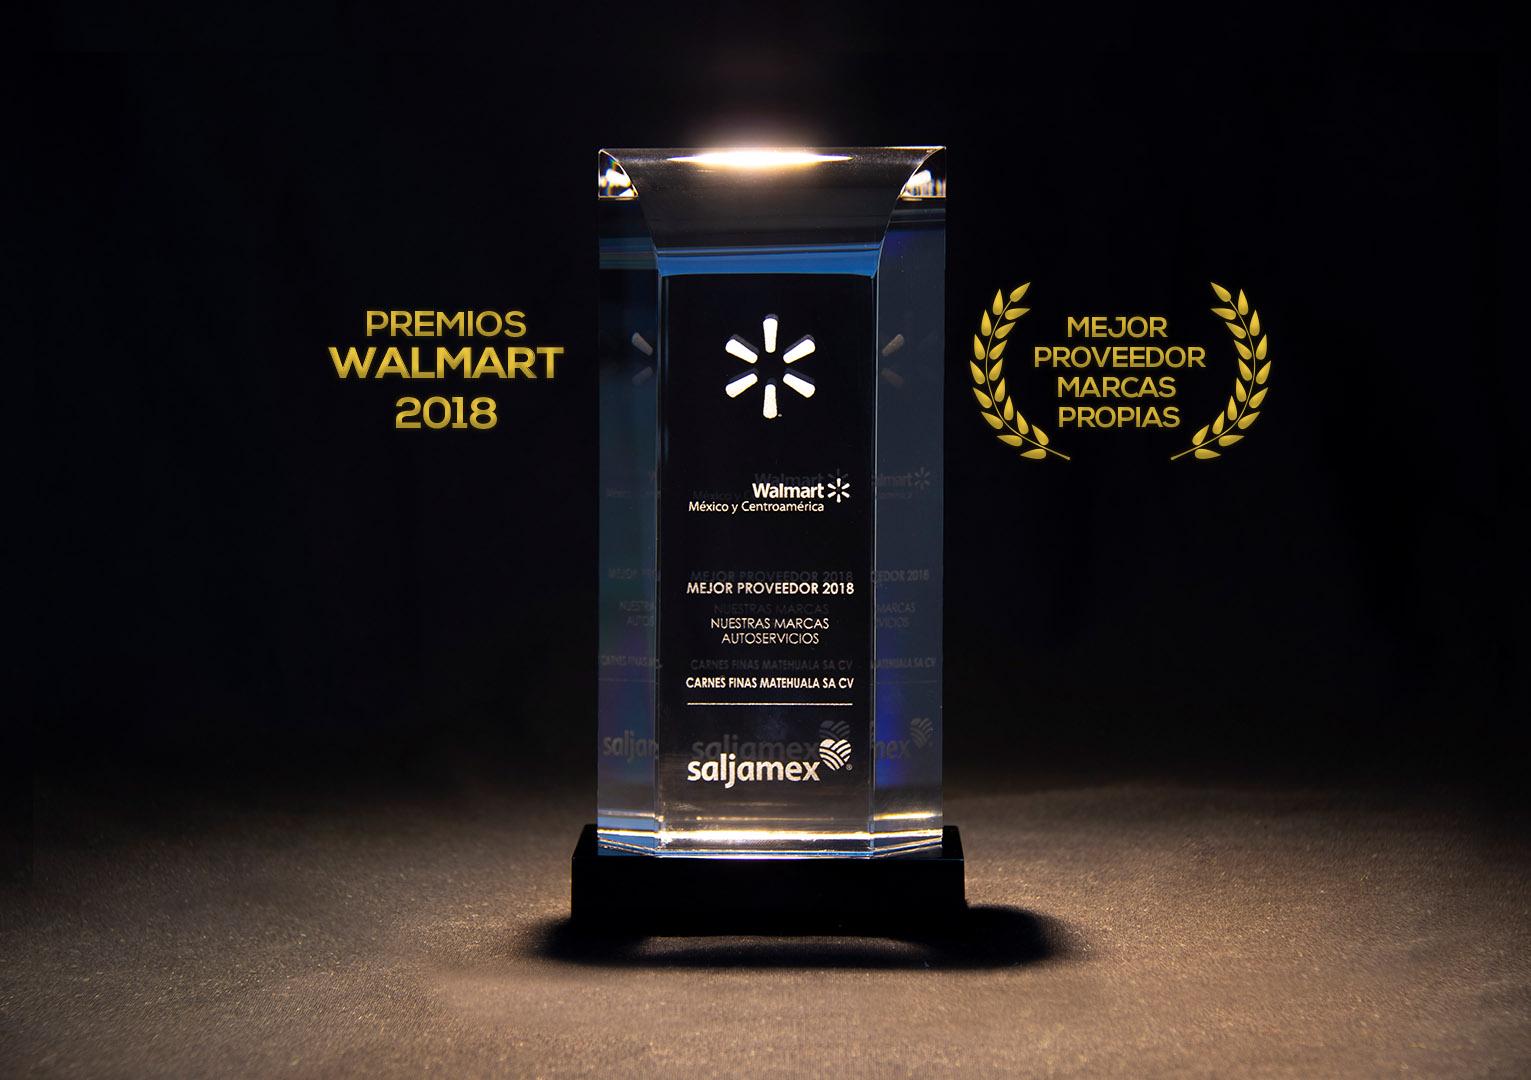 Premios-WLMT.jpg